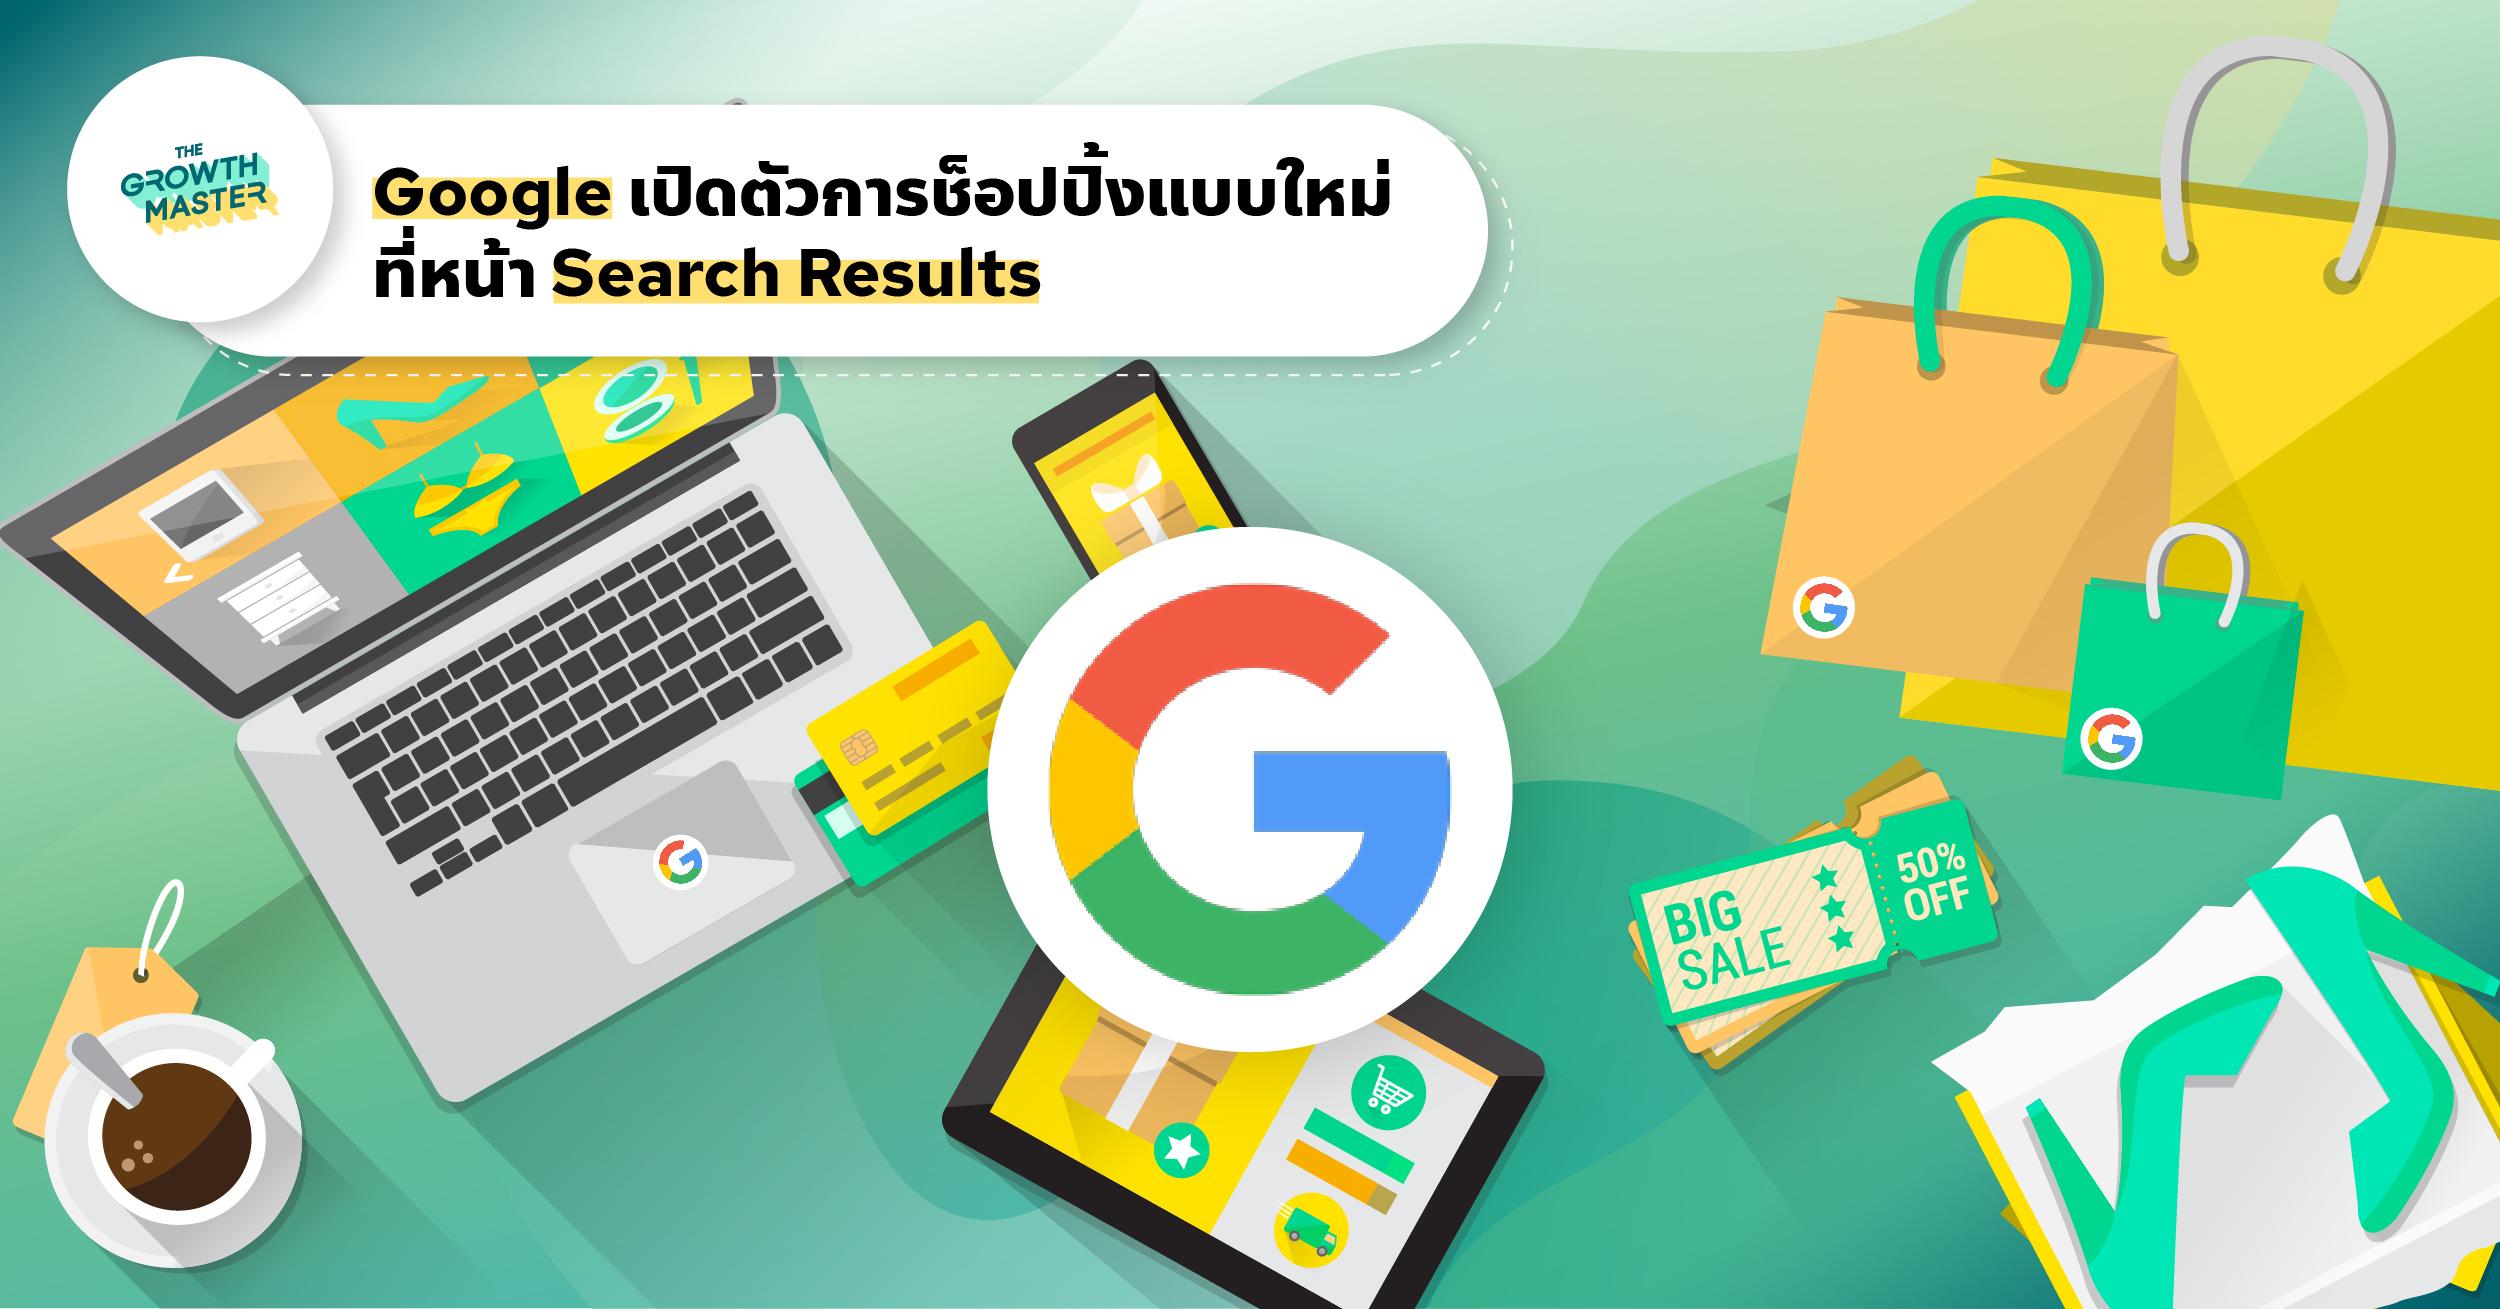 Google เปิดตัวเซคชันการชอปปิ้งแบบใหม่ที่หน้า Search Results